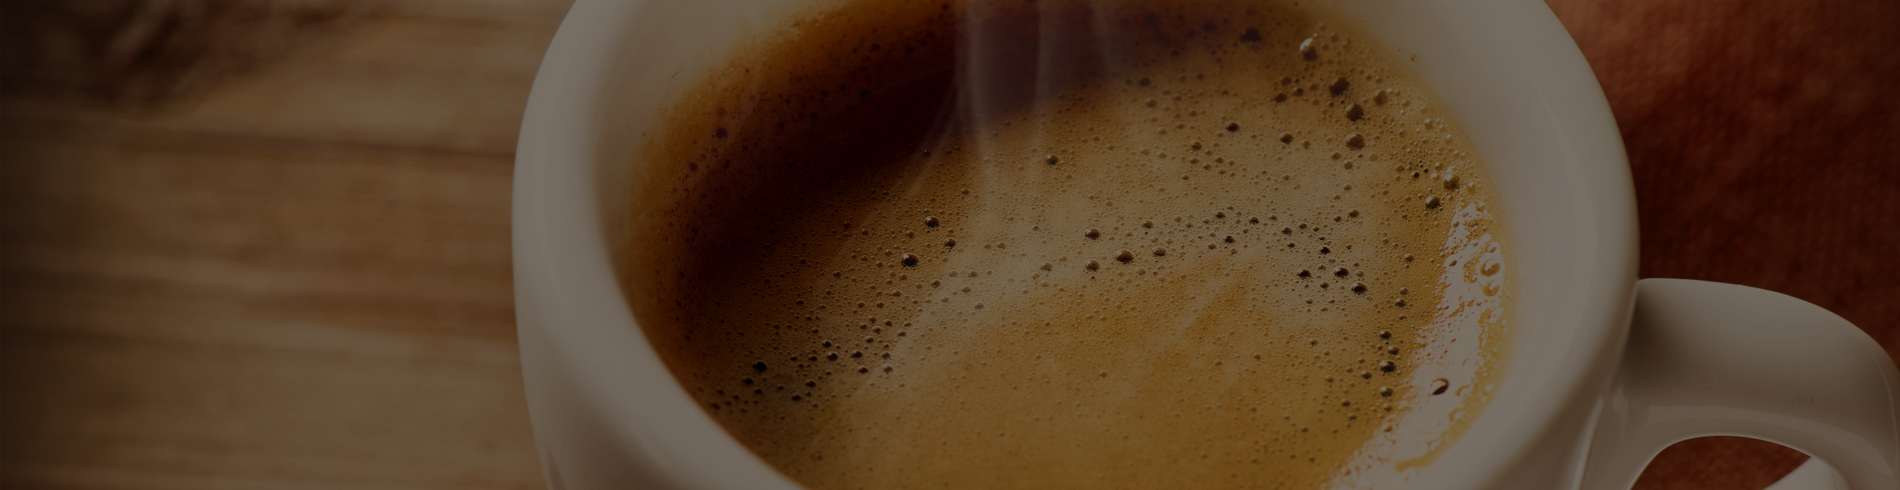 Nos digestifs, cafés et thés